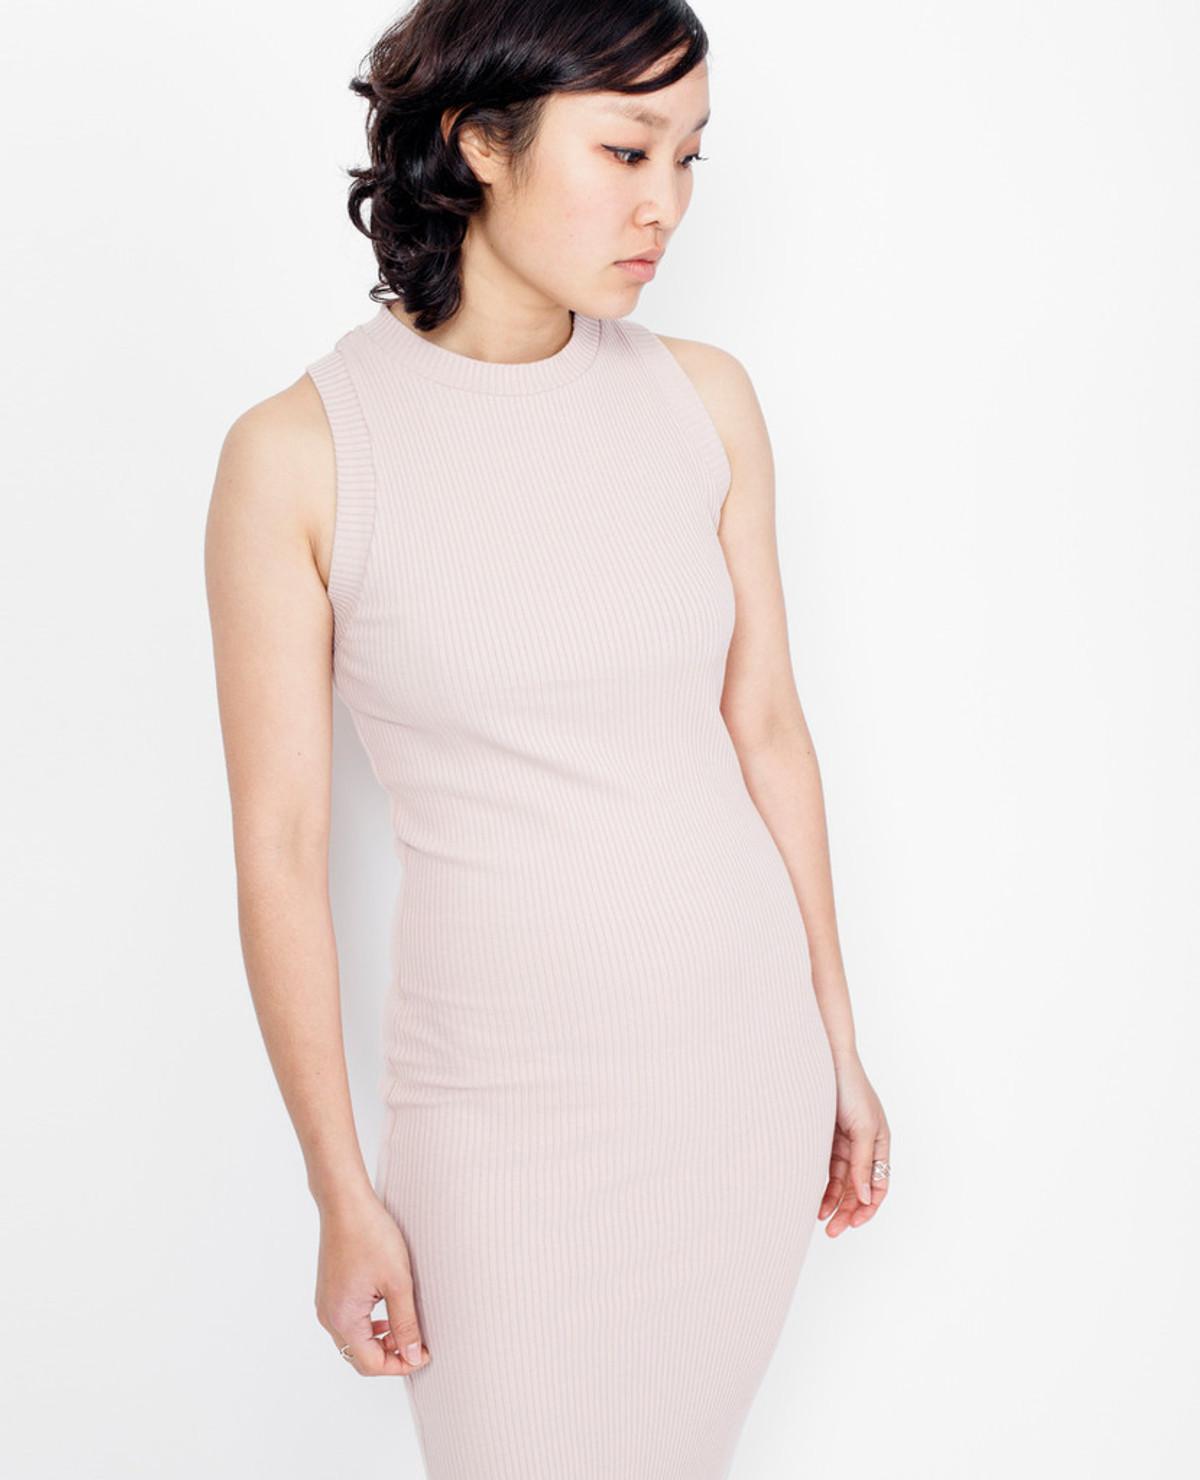 Stark Dress - Puddy